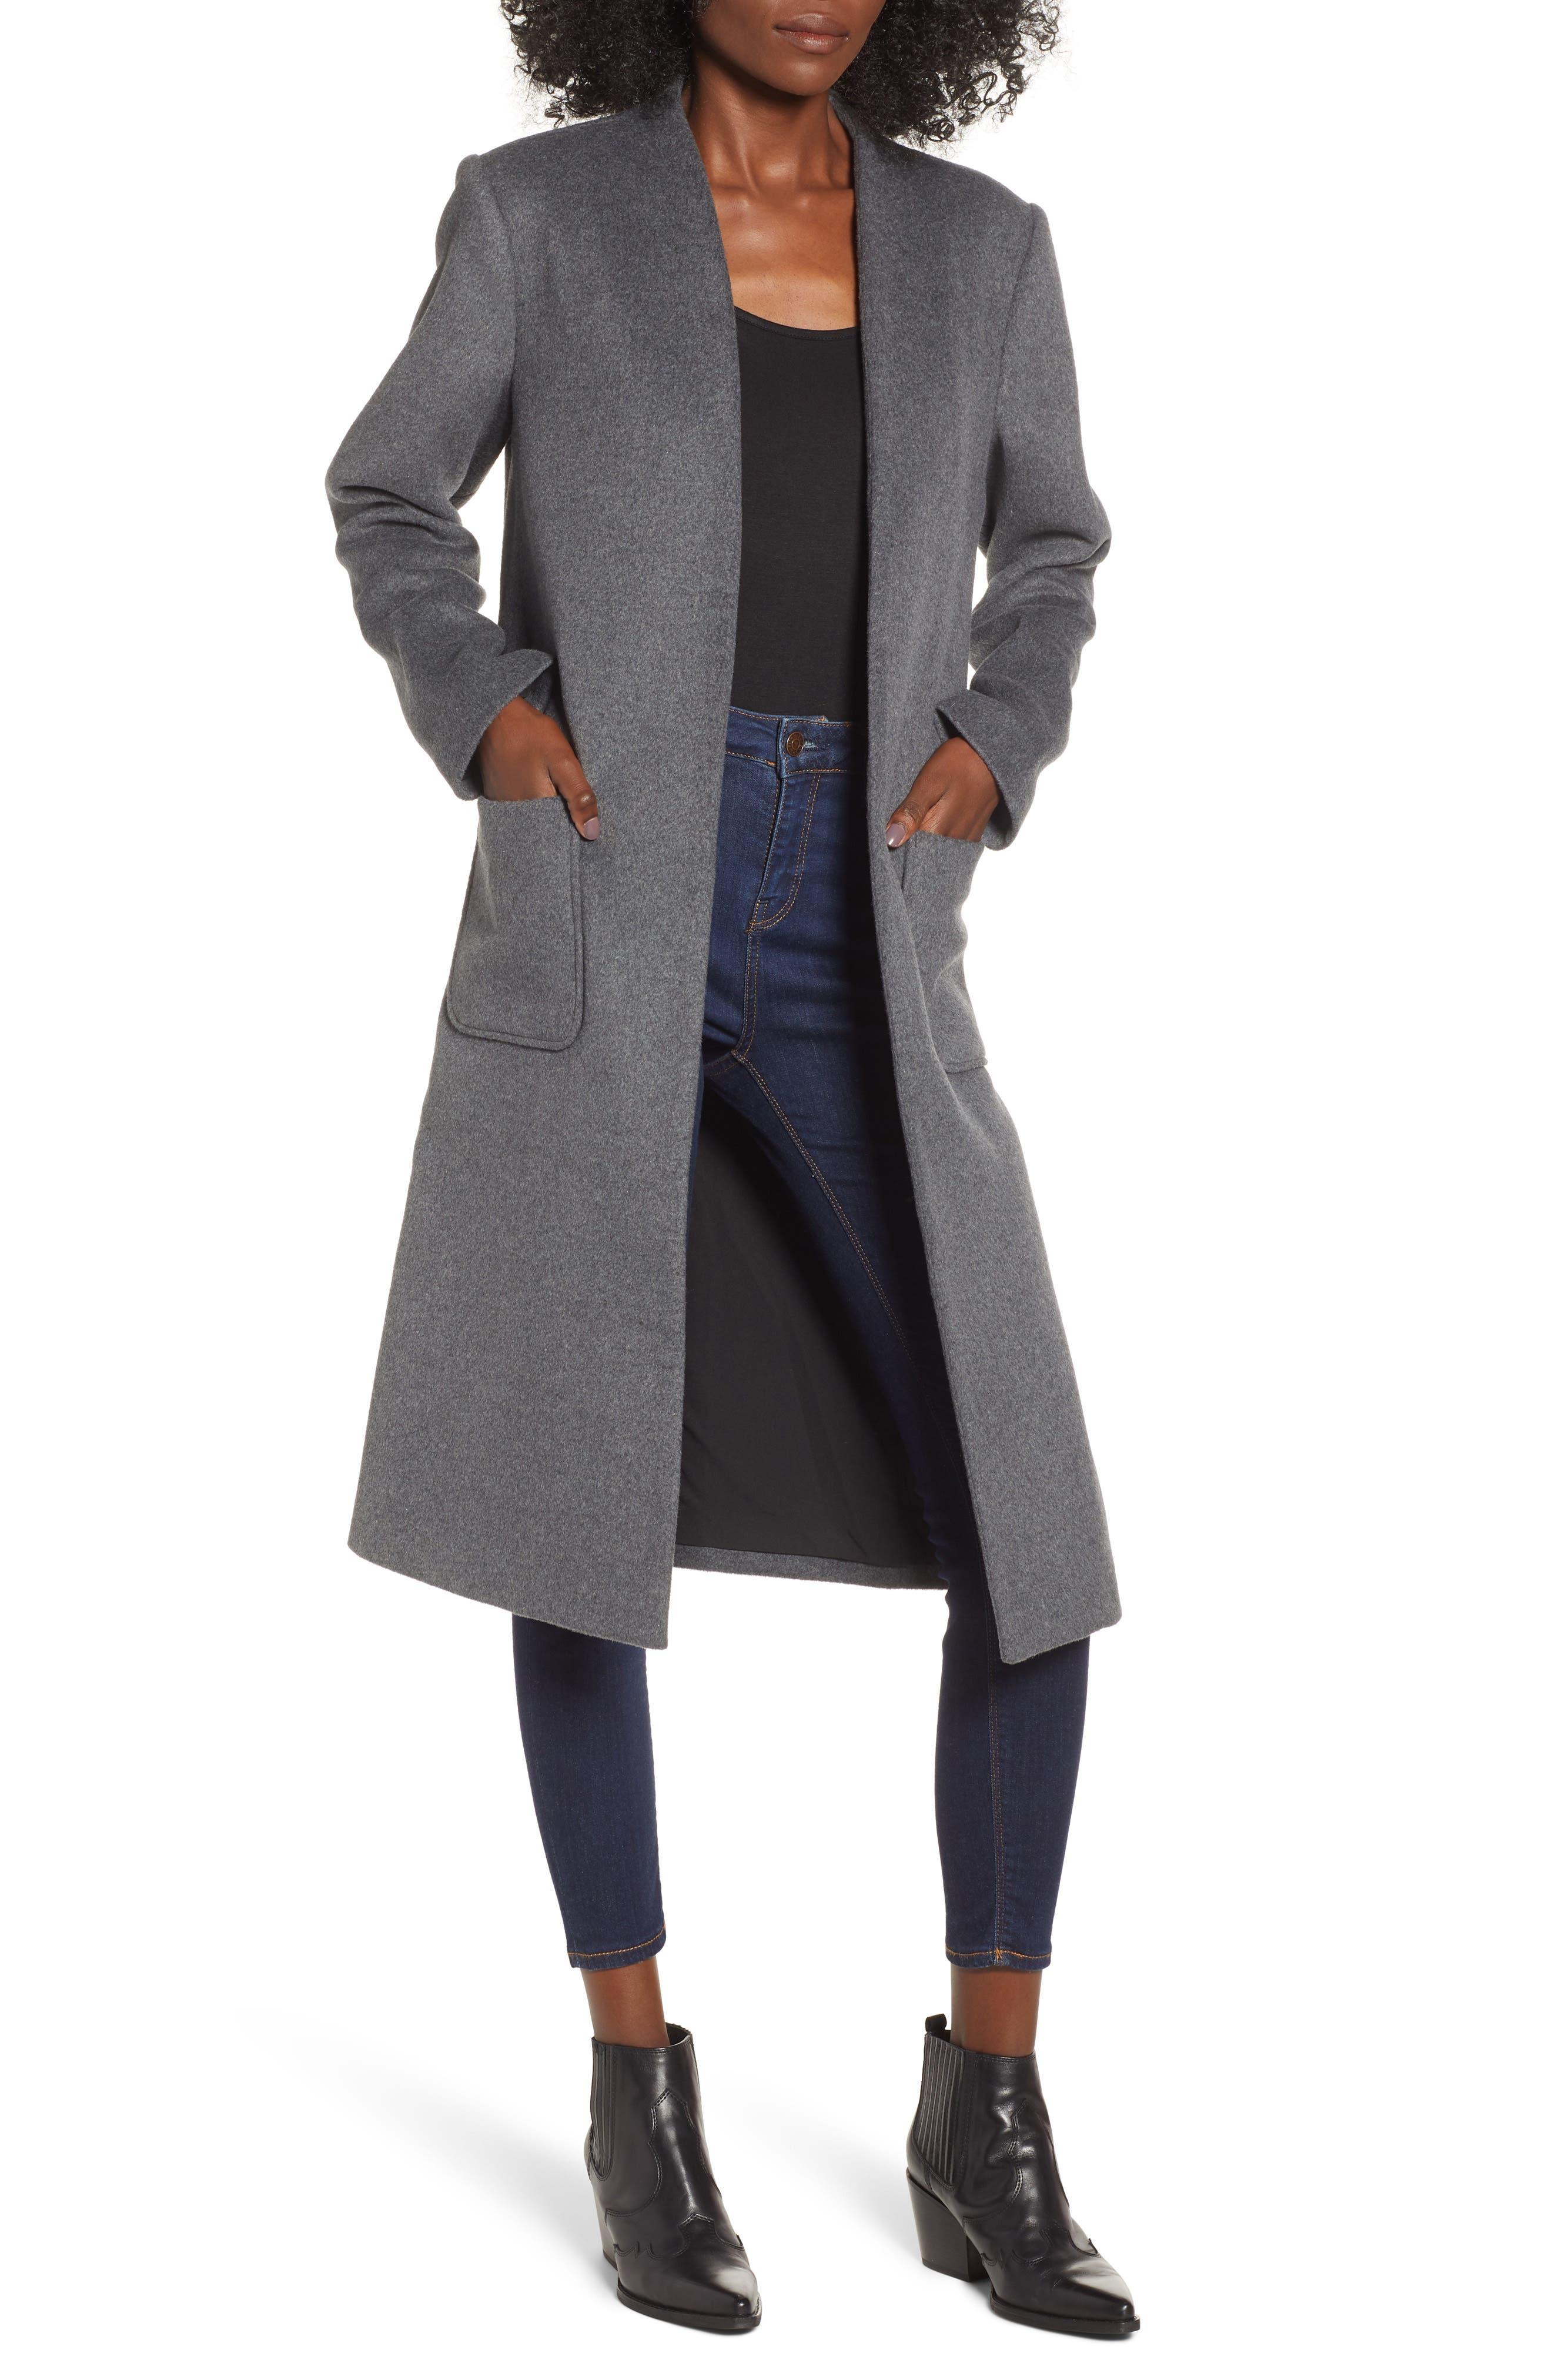 MURAL, Long Open Front Coat, Main thumbnail 1, color, 020